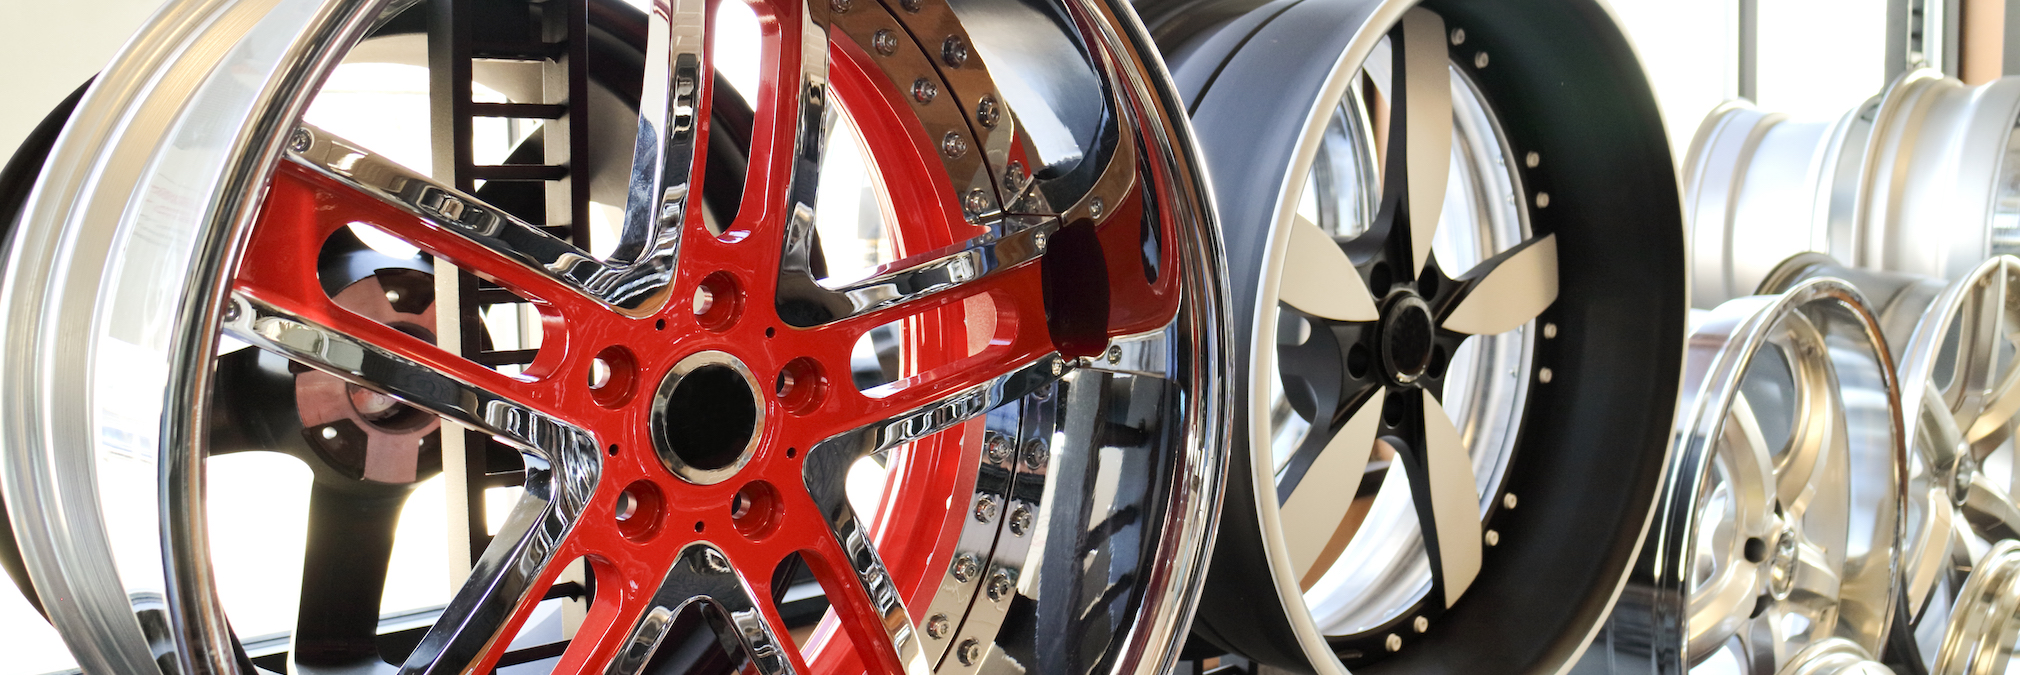 Custom alloy rims in showroom. Bling, for your ride